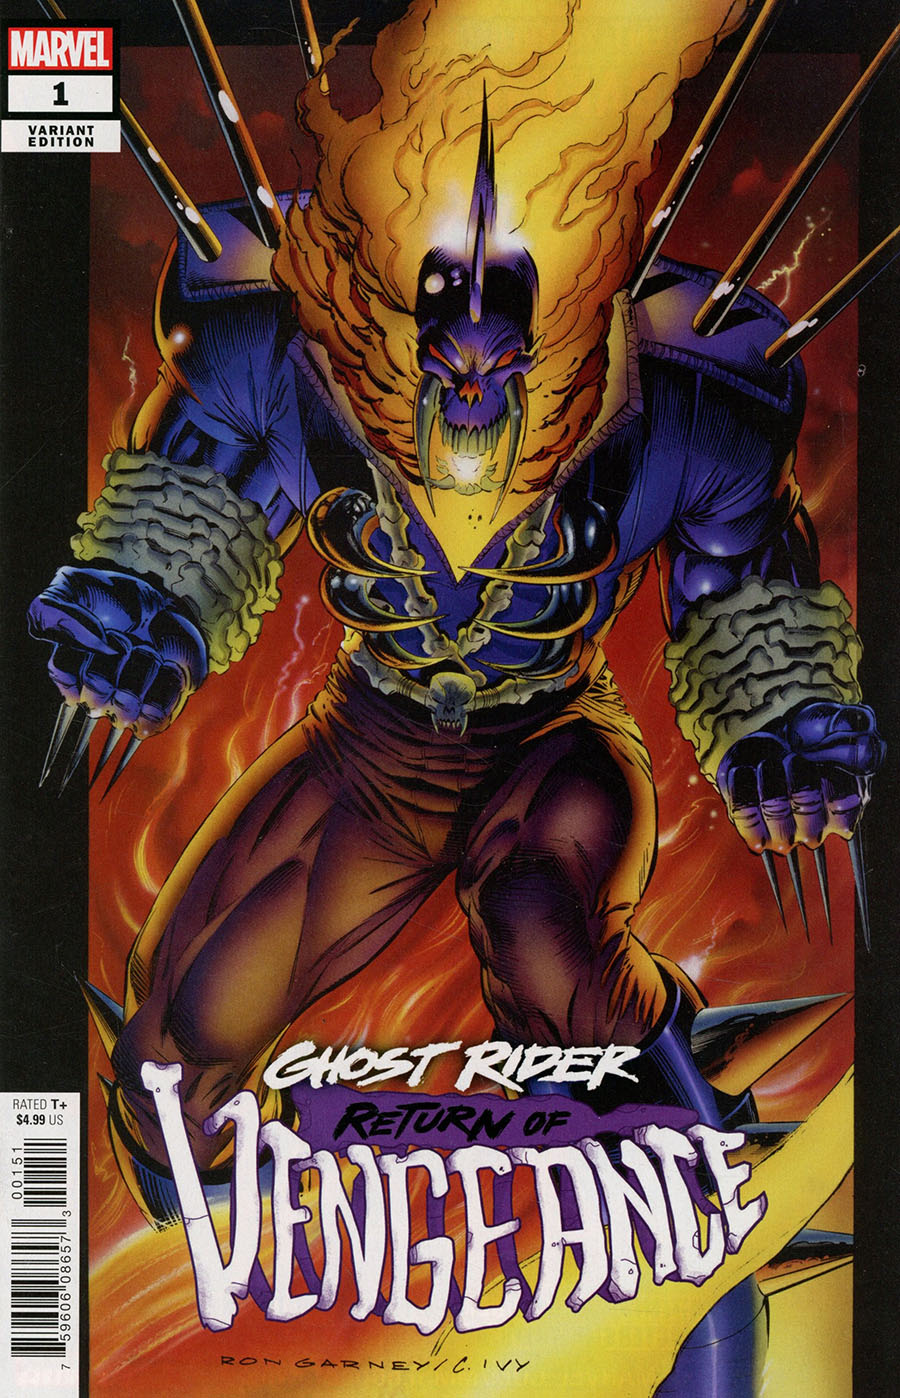 Ghost Rider Return Of Vengeance One Shot Cover E Incentive Ron Garney Hidden Gem Variant Cover